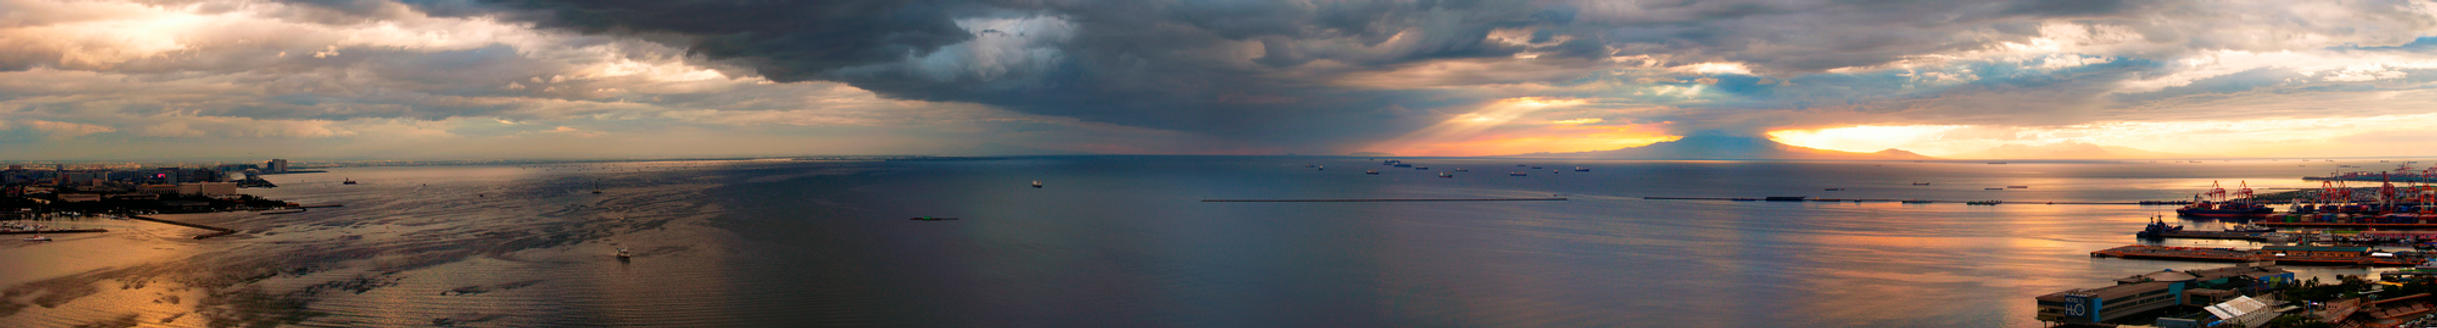 Manila Bay Sunset by PaolaTuazon